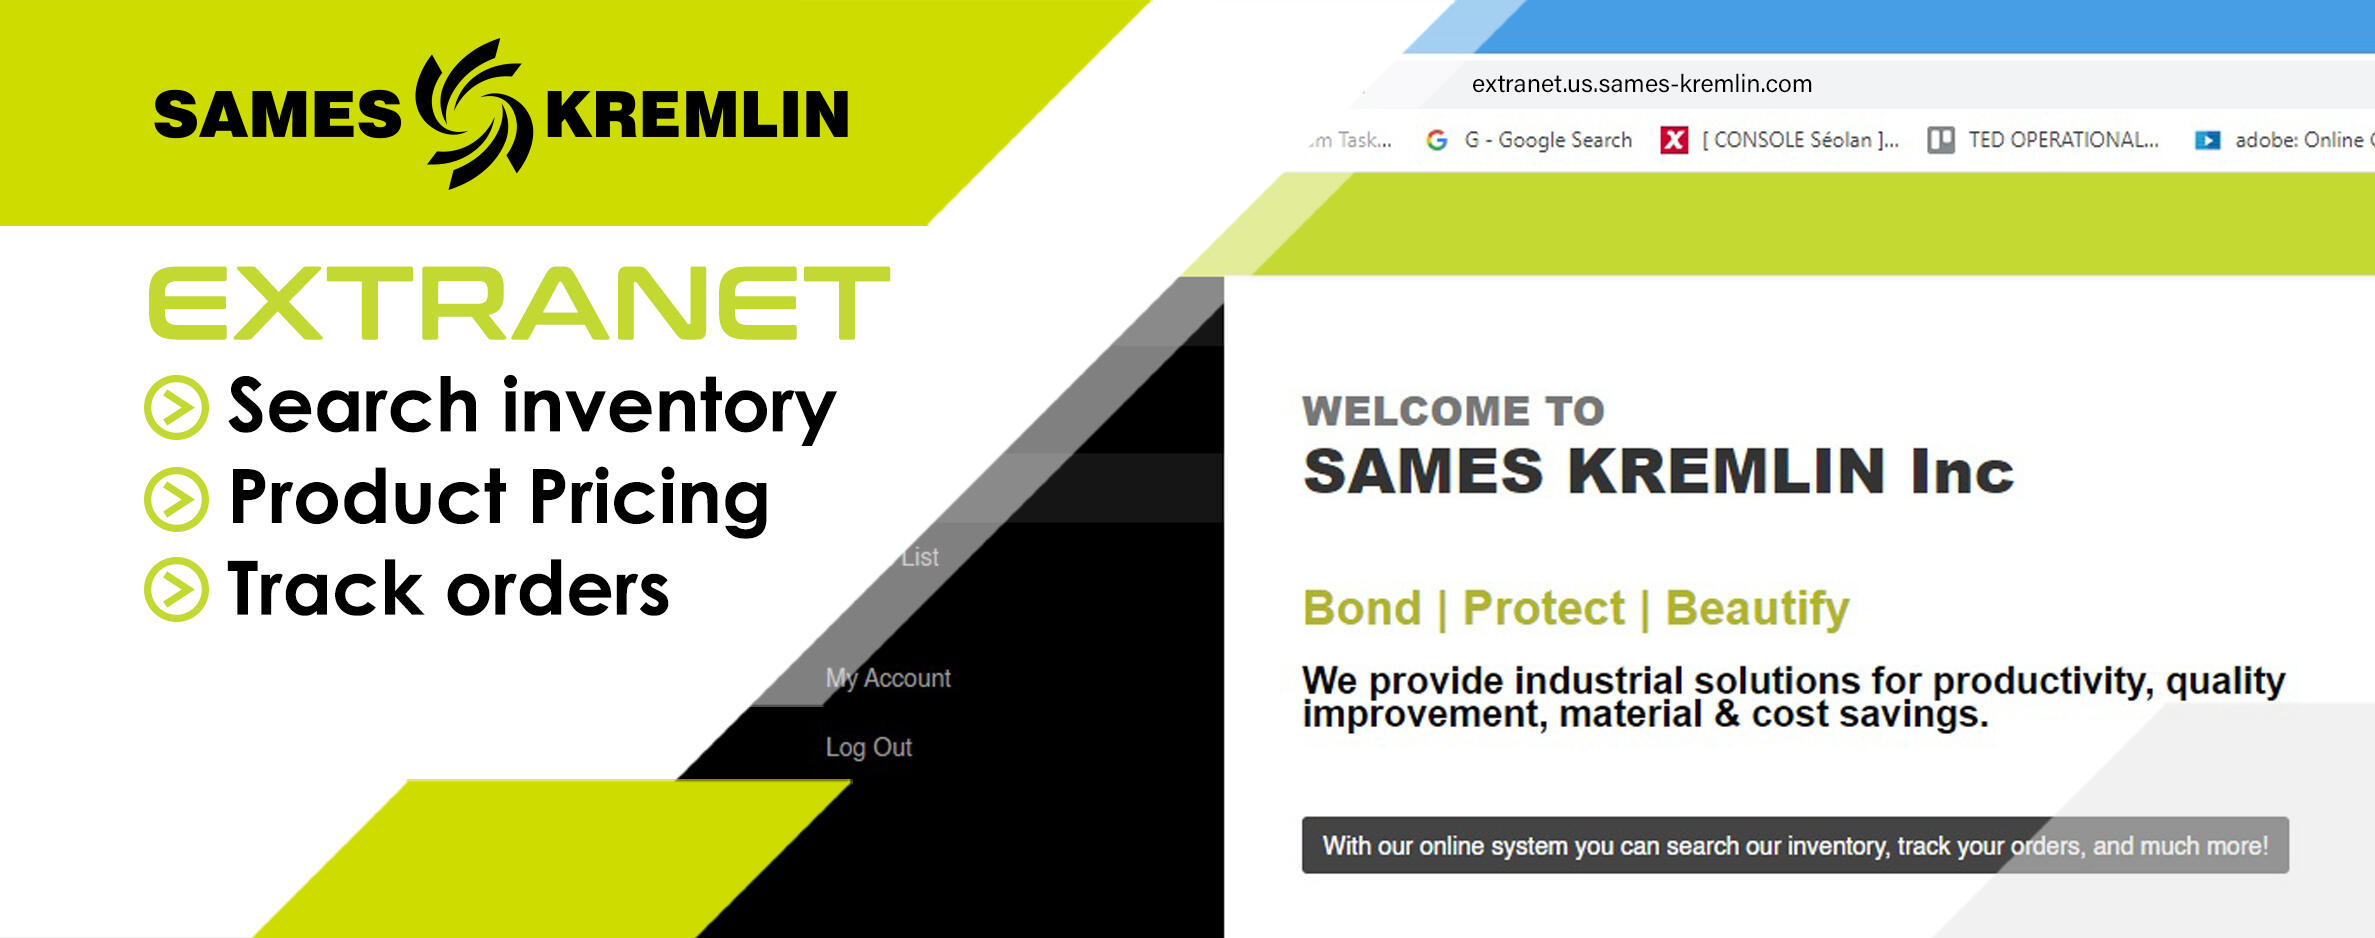 SAMES KREMLIN North America Extranet Site